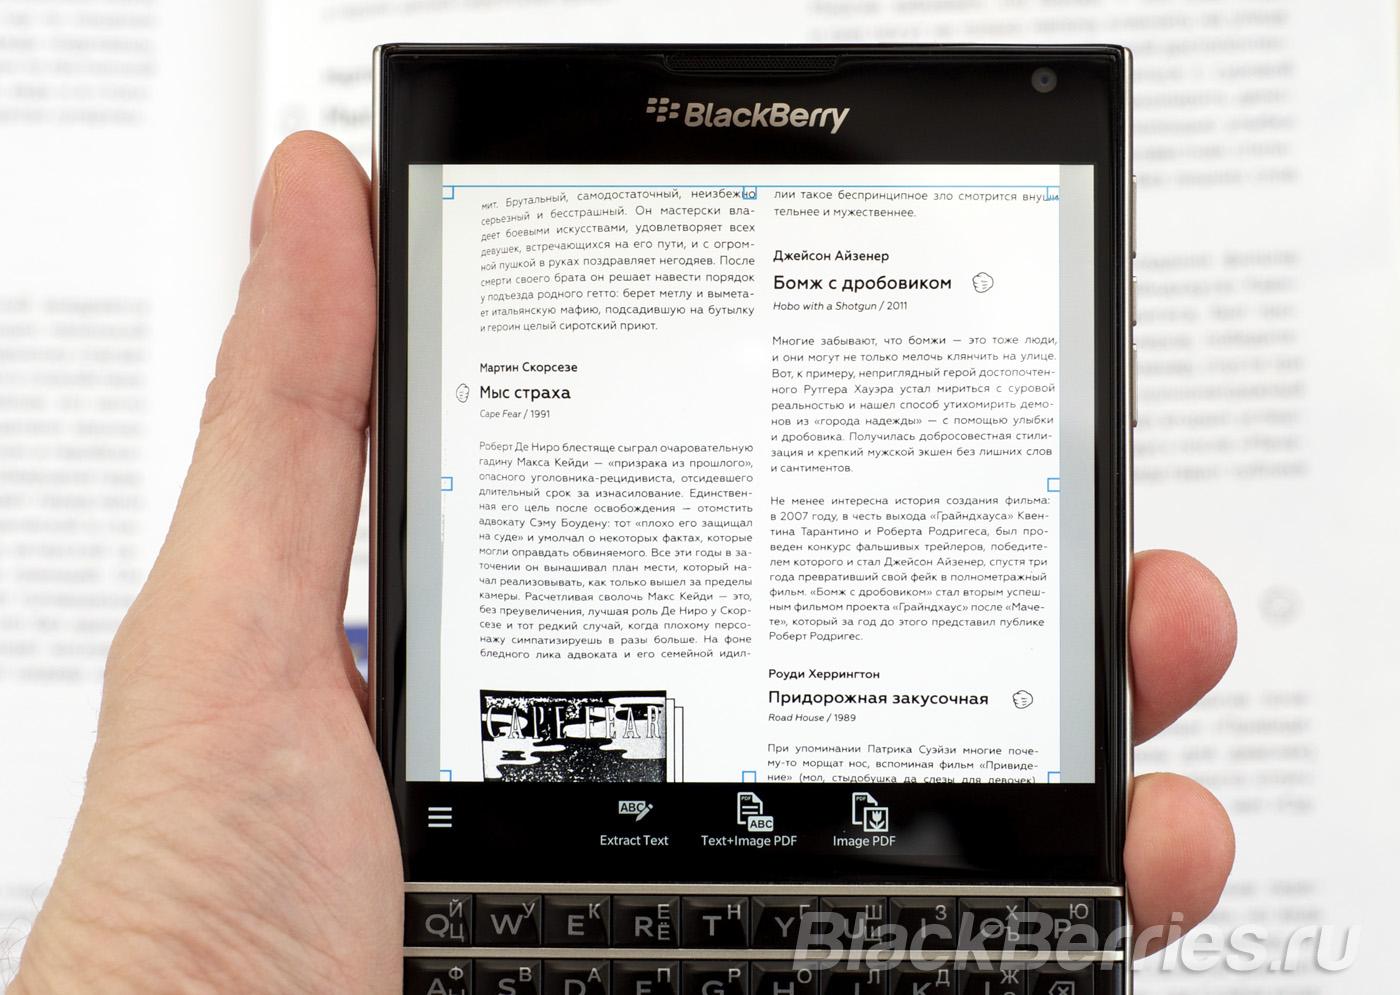 BlackBerry-Passport-Scan